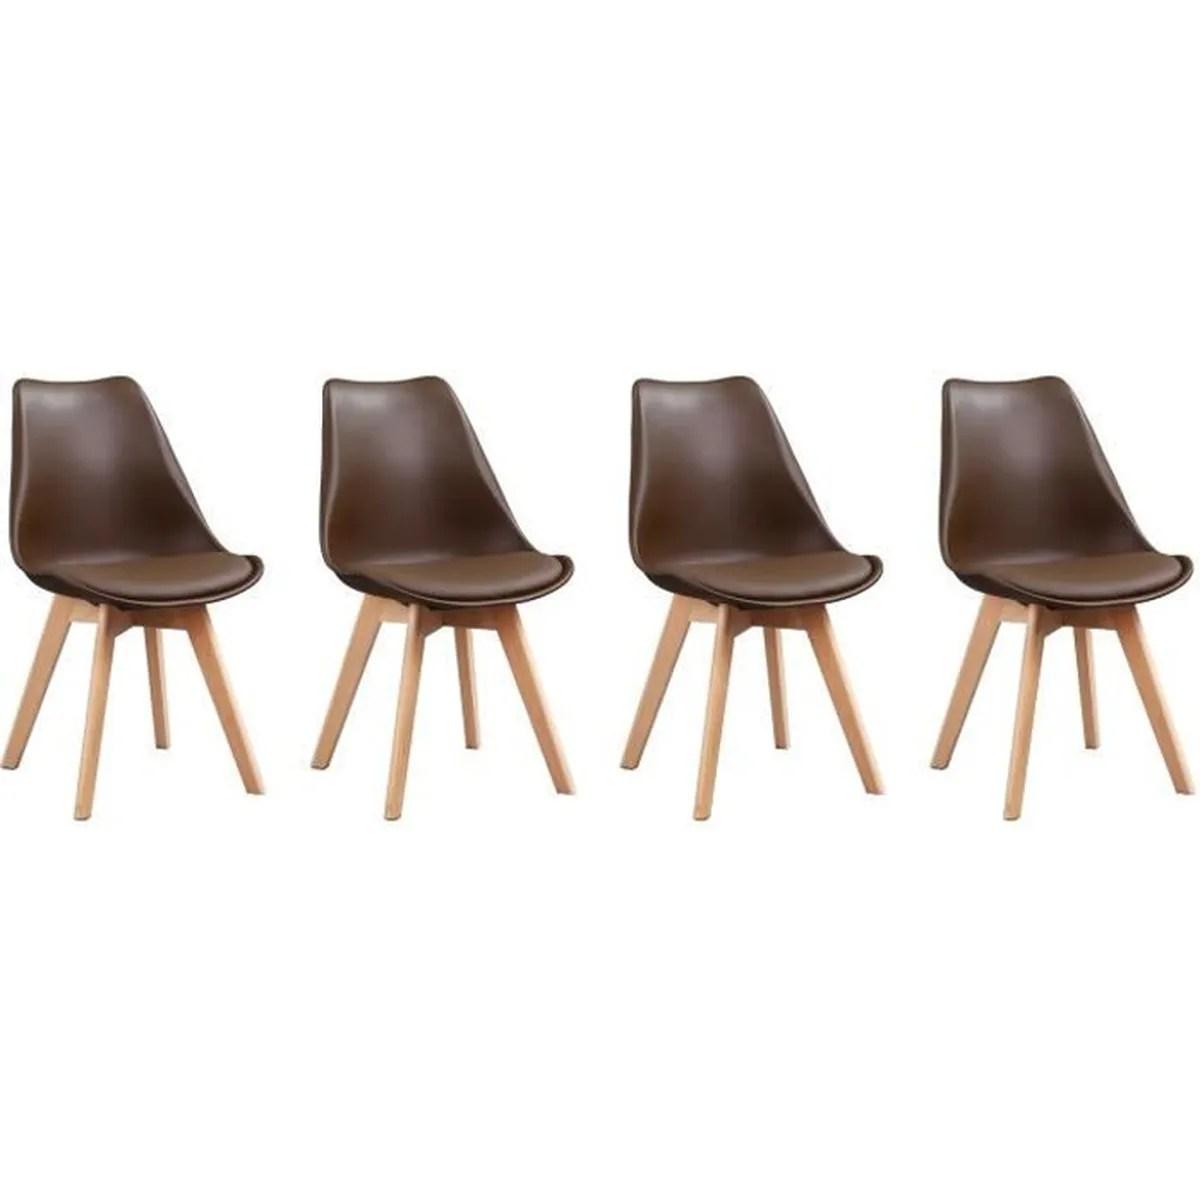 4 chaises scandinaves nora marron